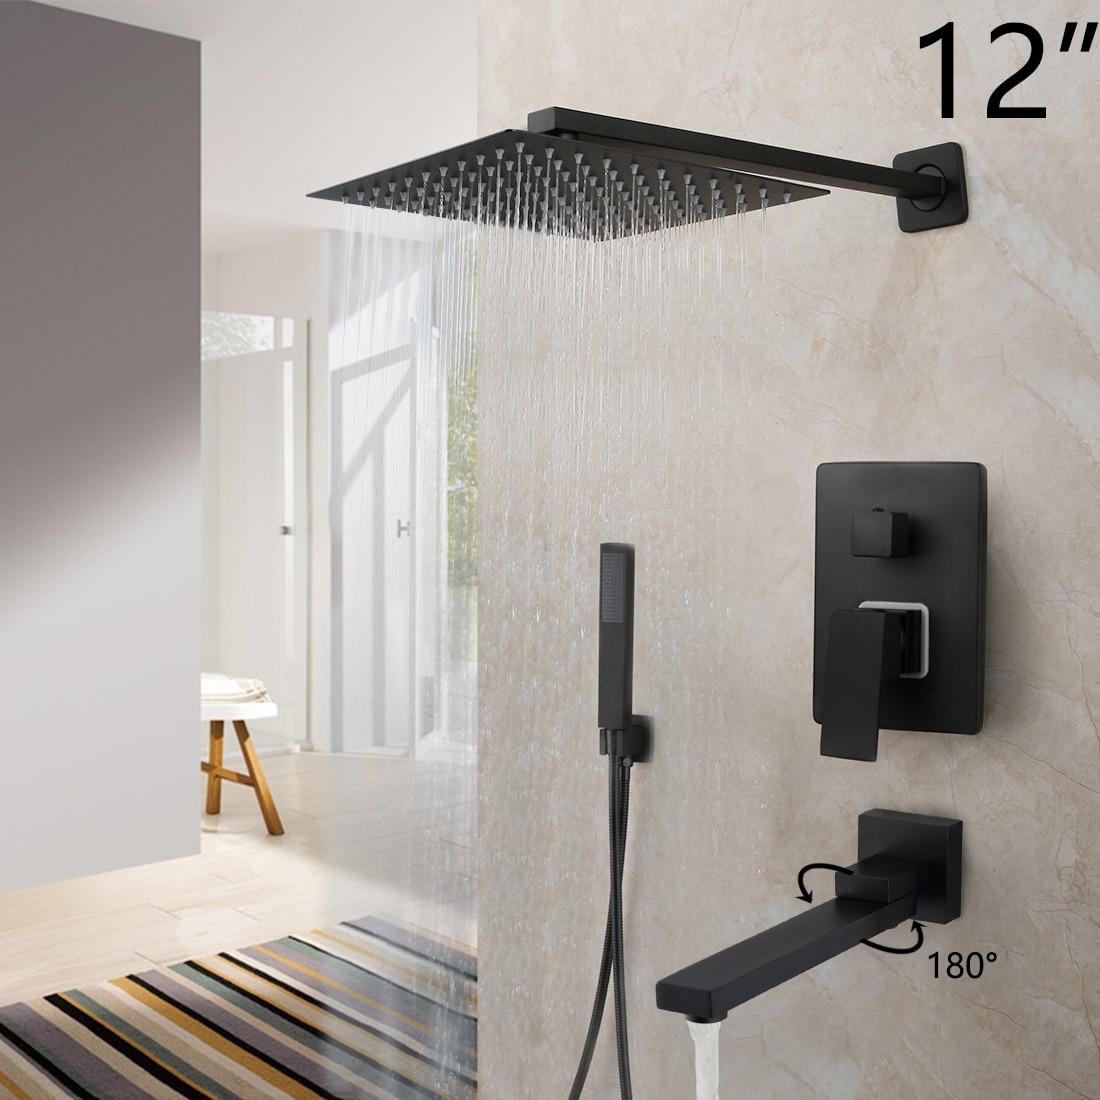 12 Inch Shower W2